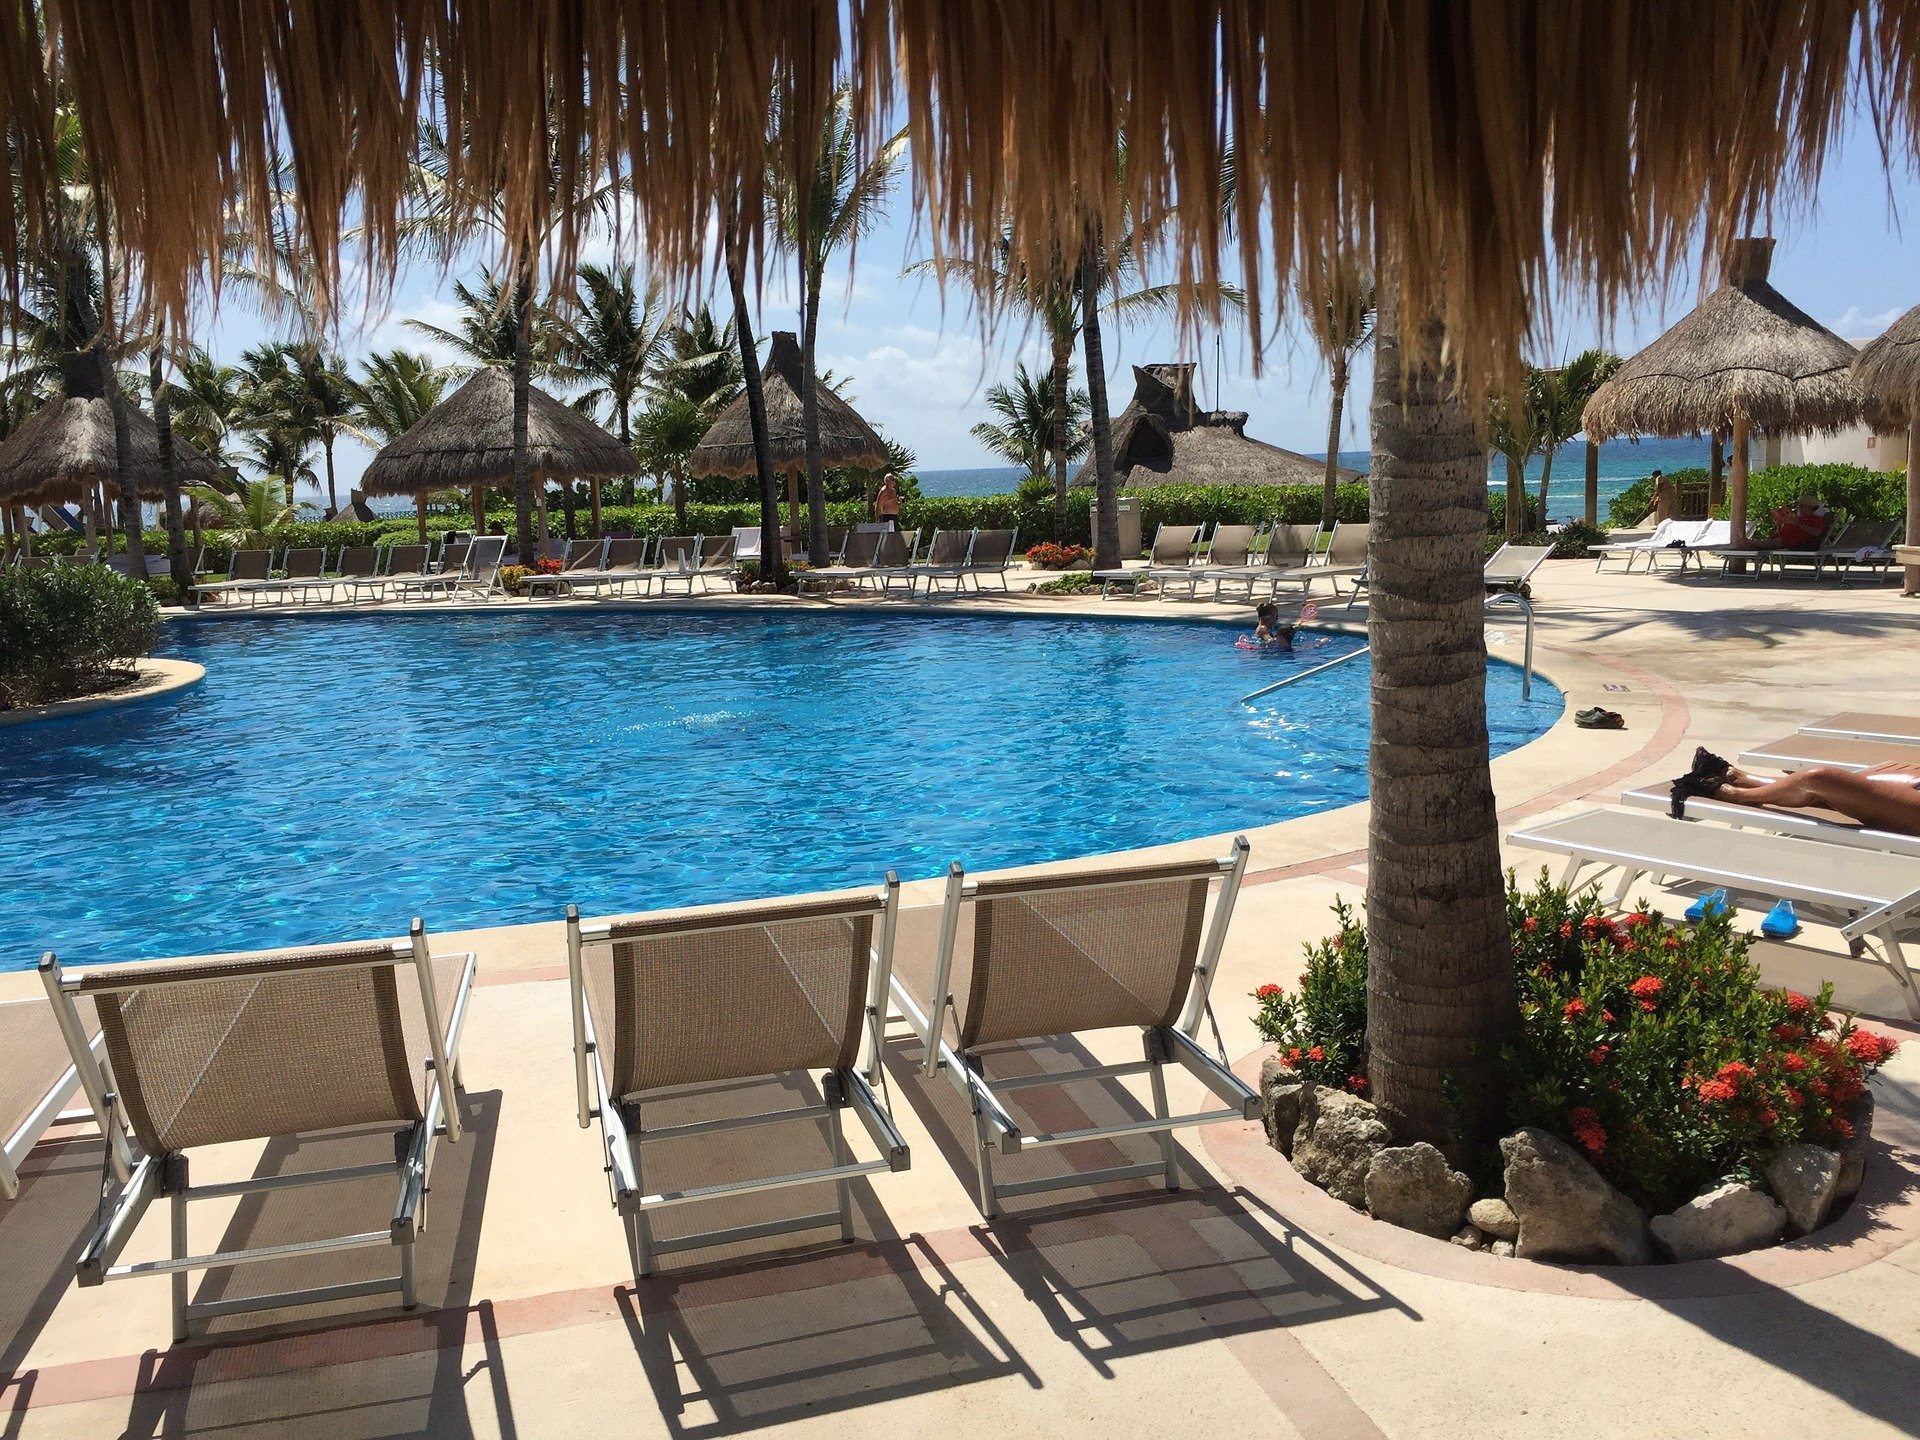 8 mil 268 empleos generó Quintana Roo en noviembre